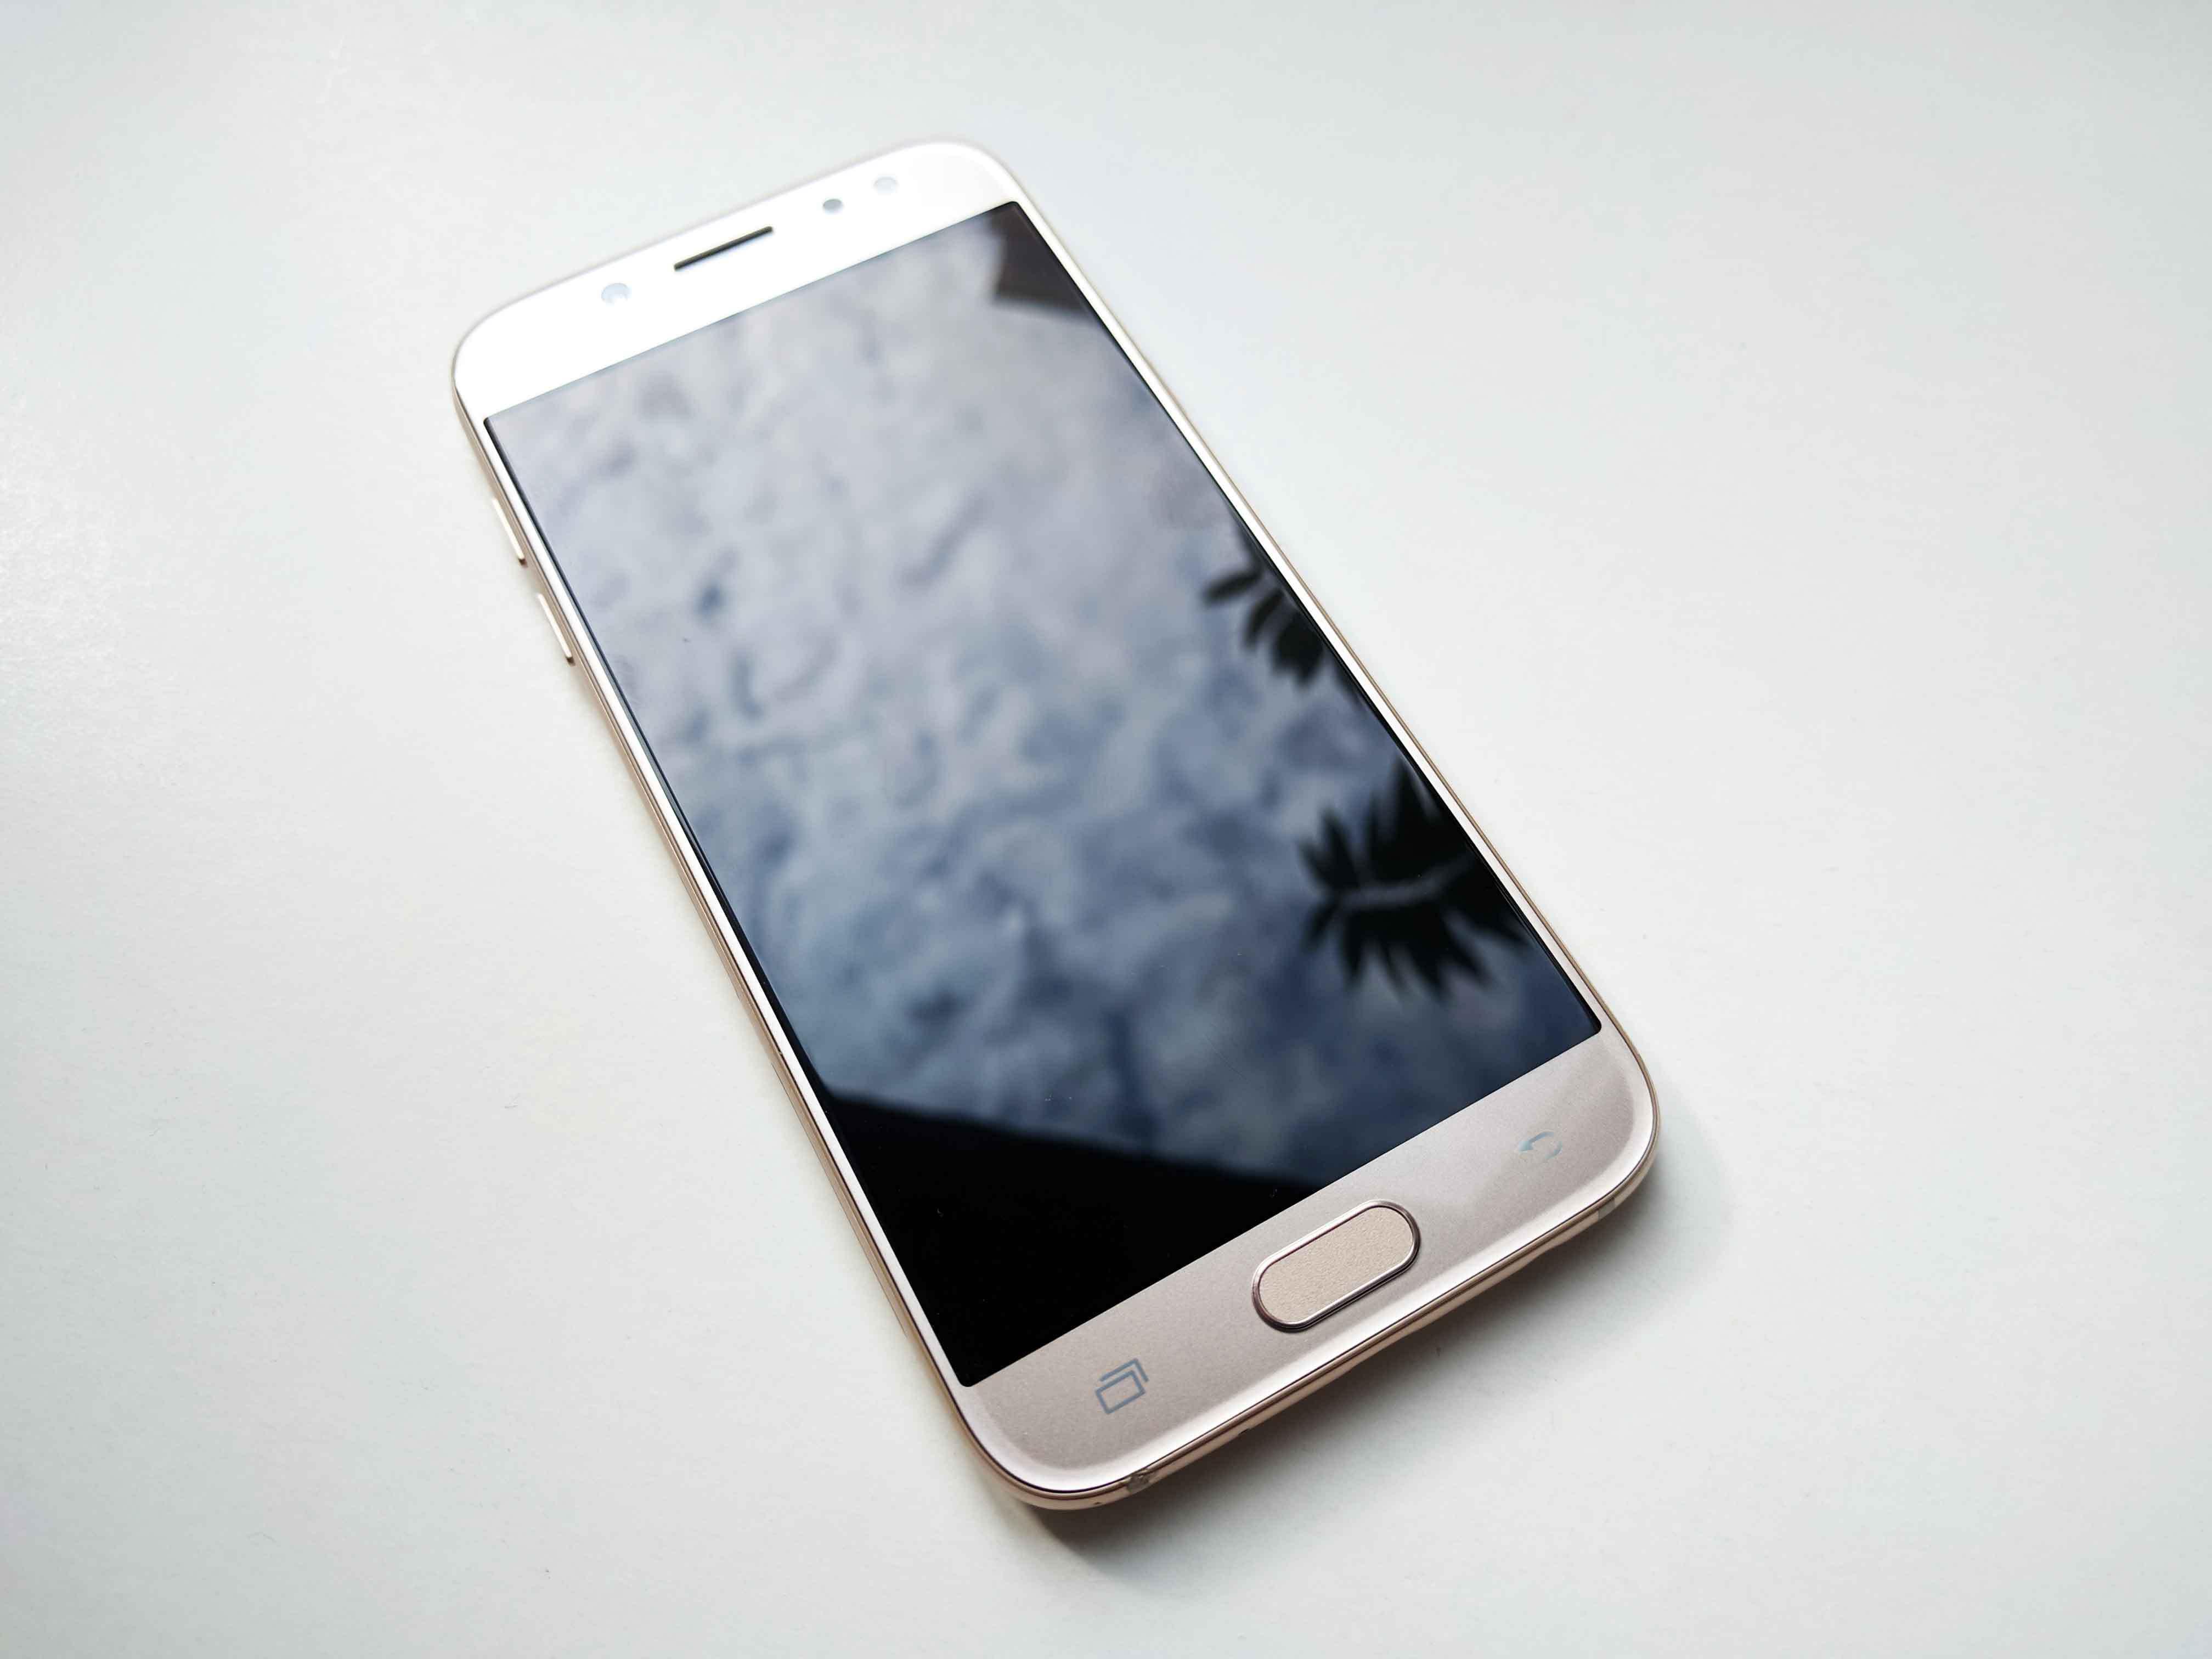 Samsung Galaxy J5 (2017) Review Romana, Pareri - foto 2